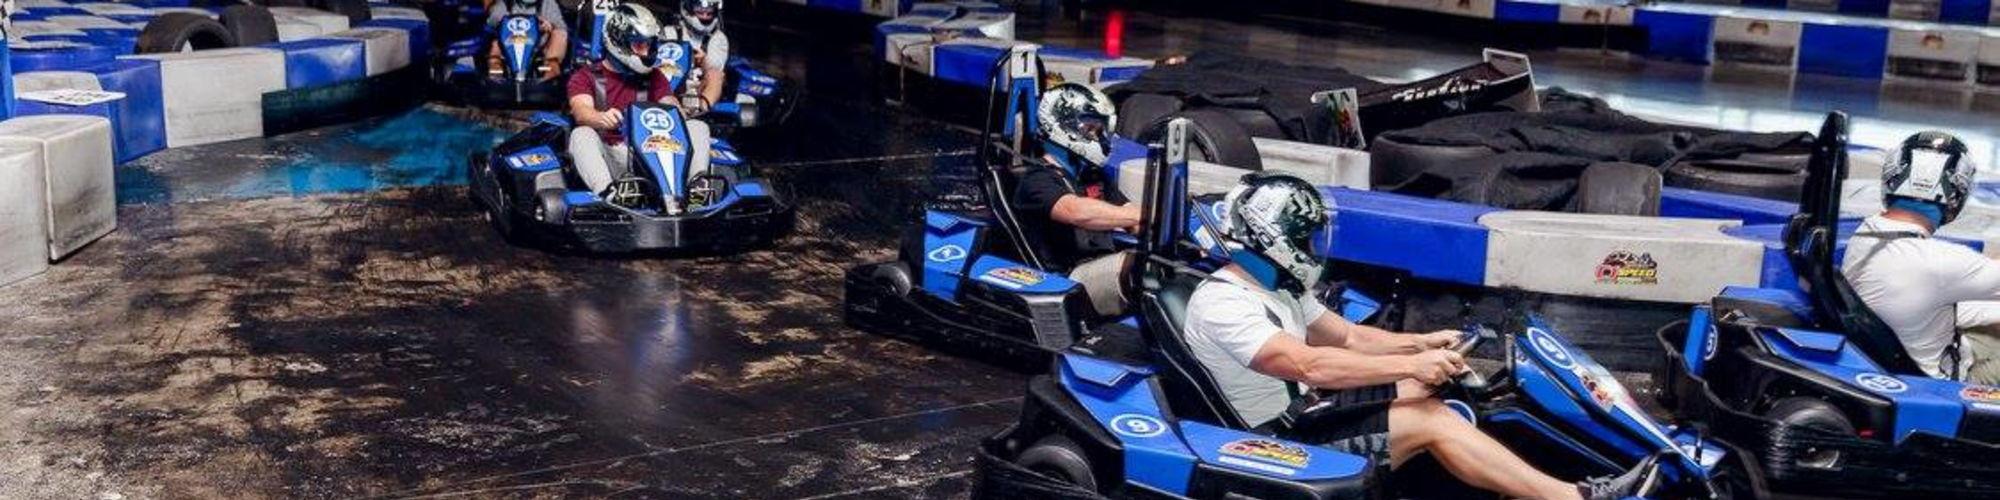 C1 Speed Indoor Karting  cover image